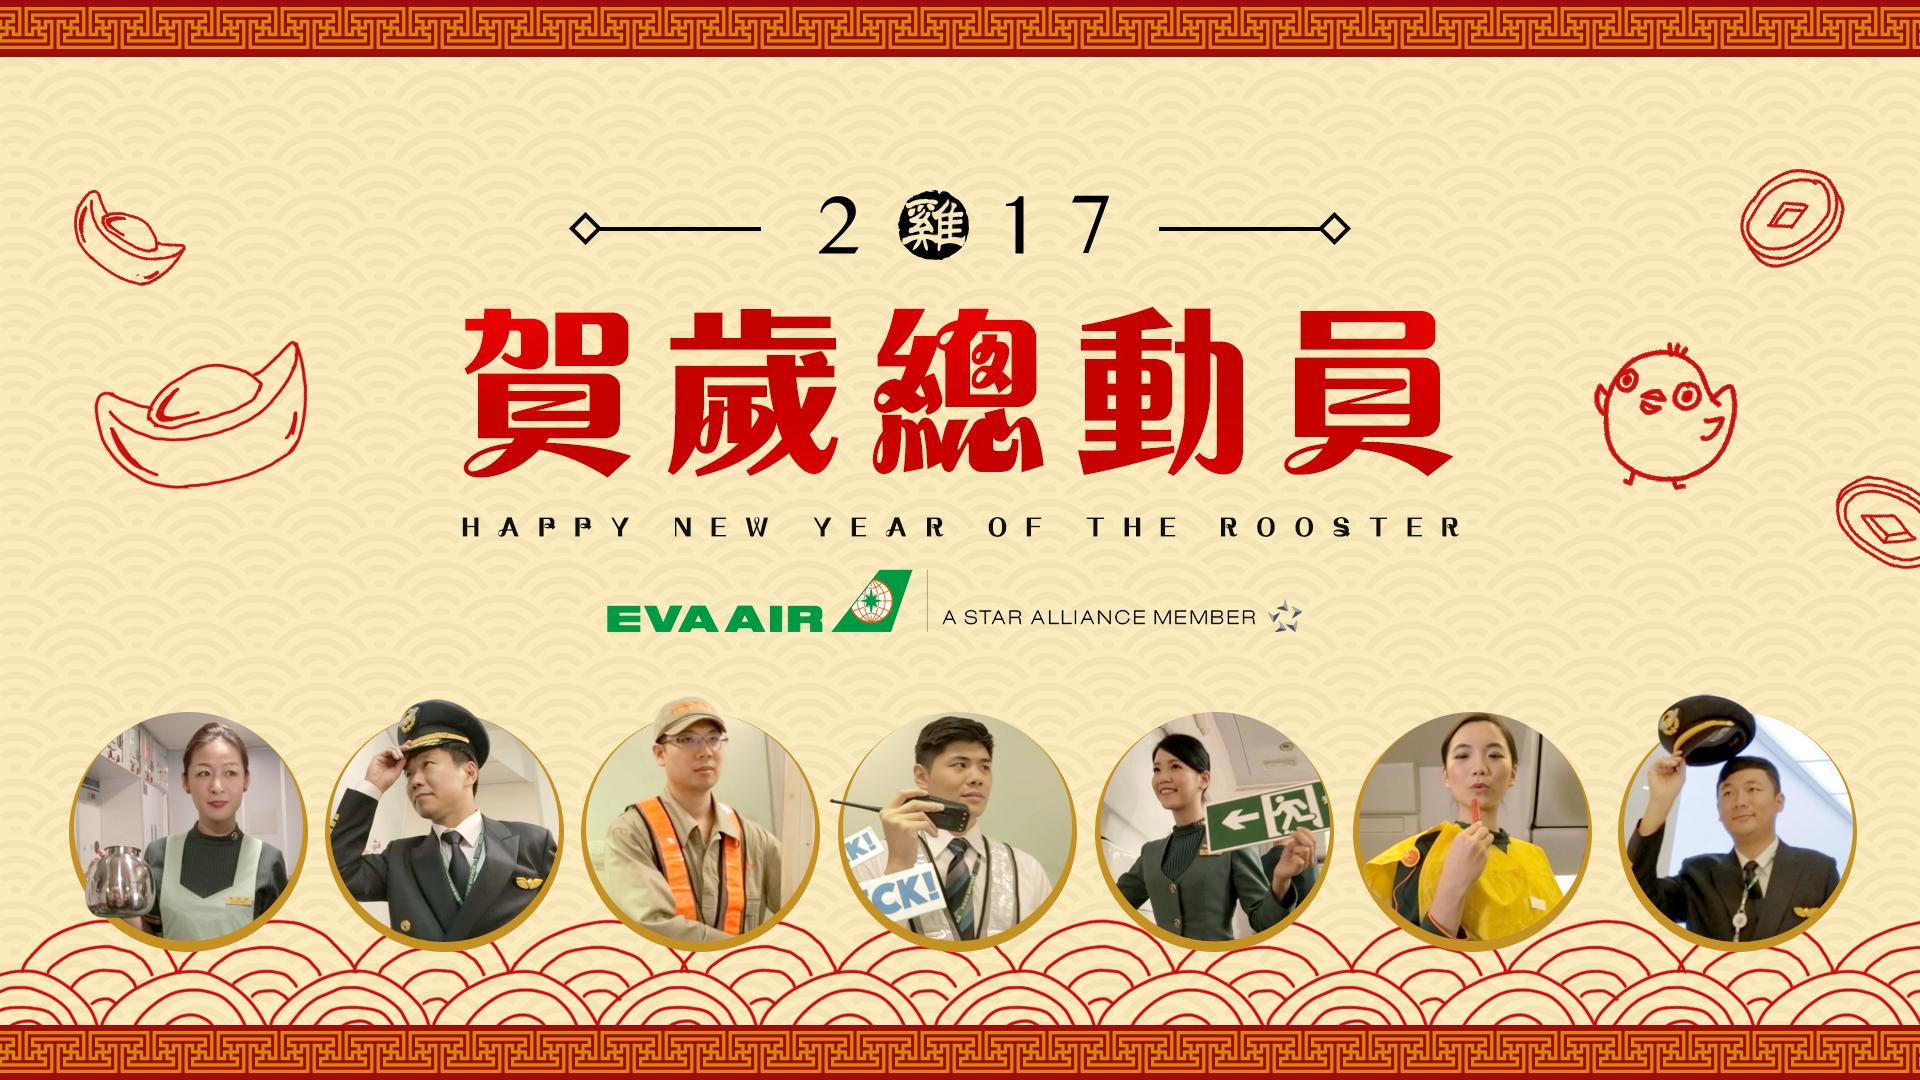 20170120150241_hVyaA3PbEV